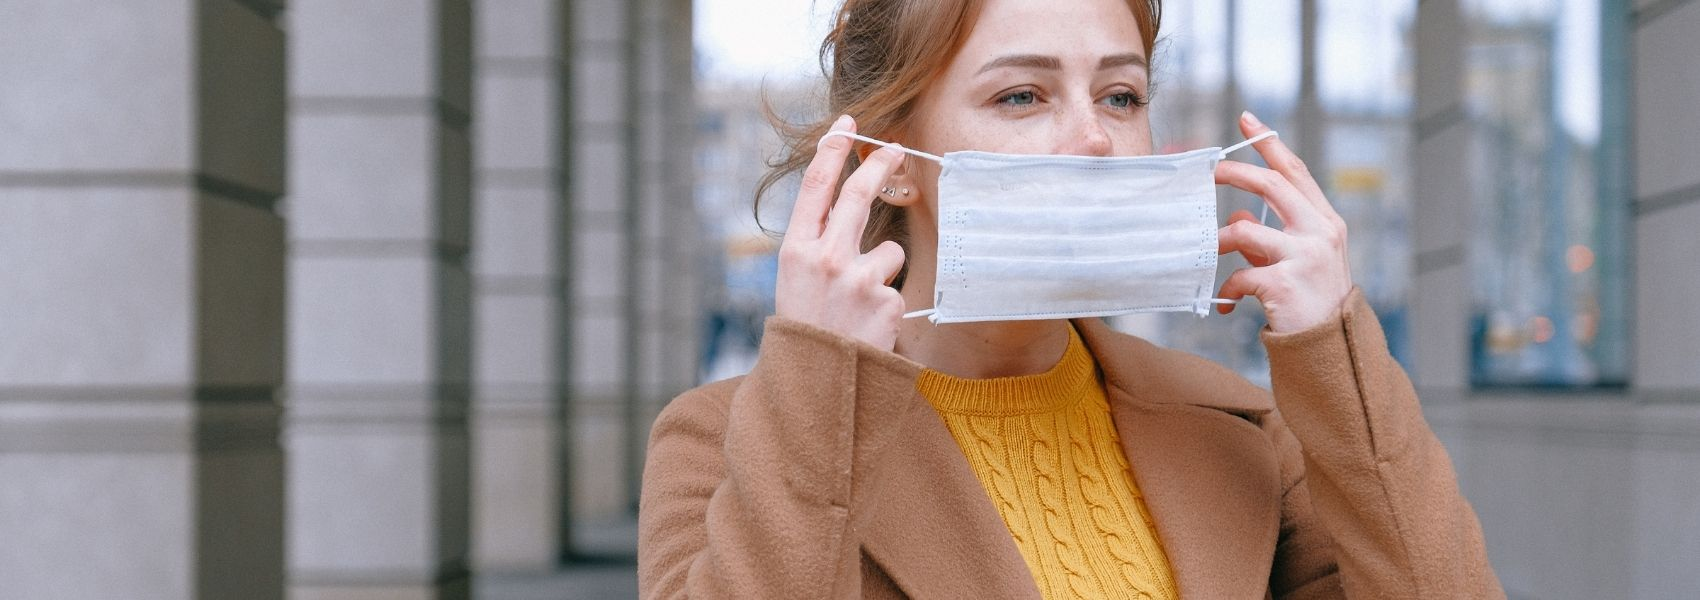 A perda do sentido do olfato e paladar pode durar até cinco meses após a COVID-19